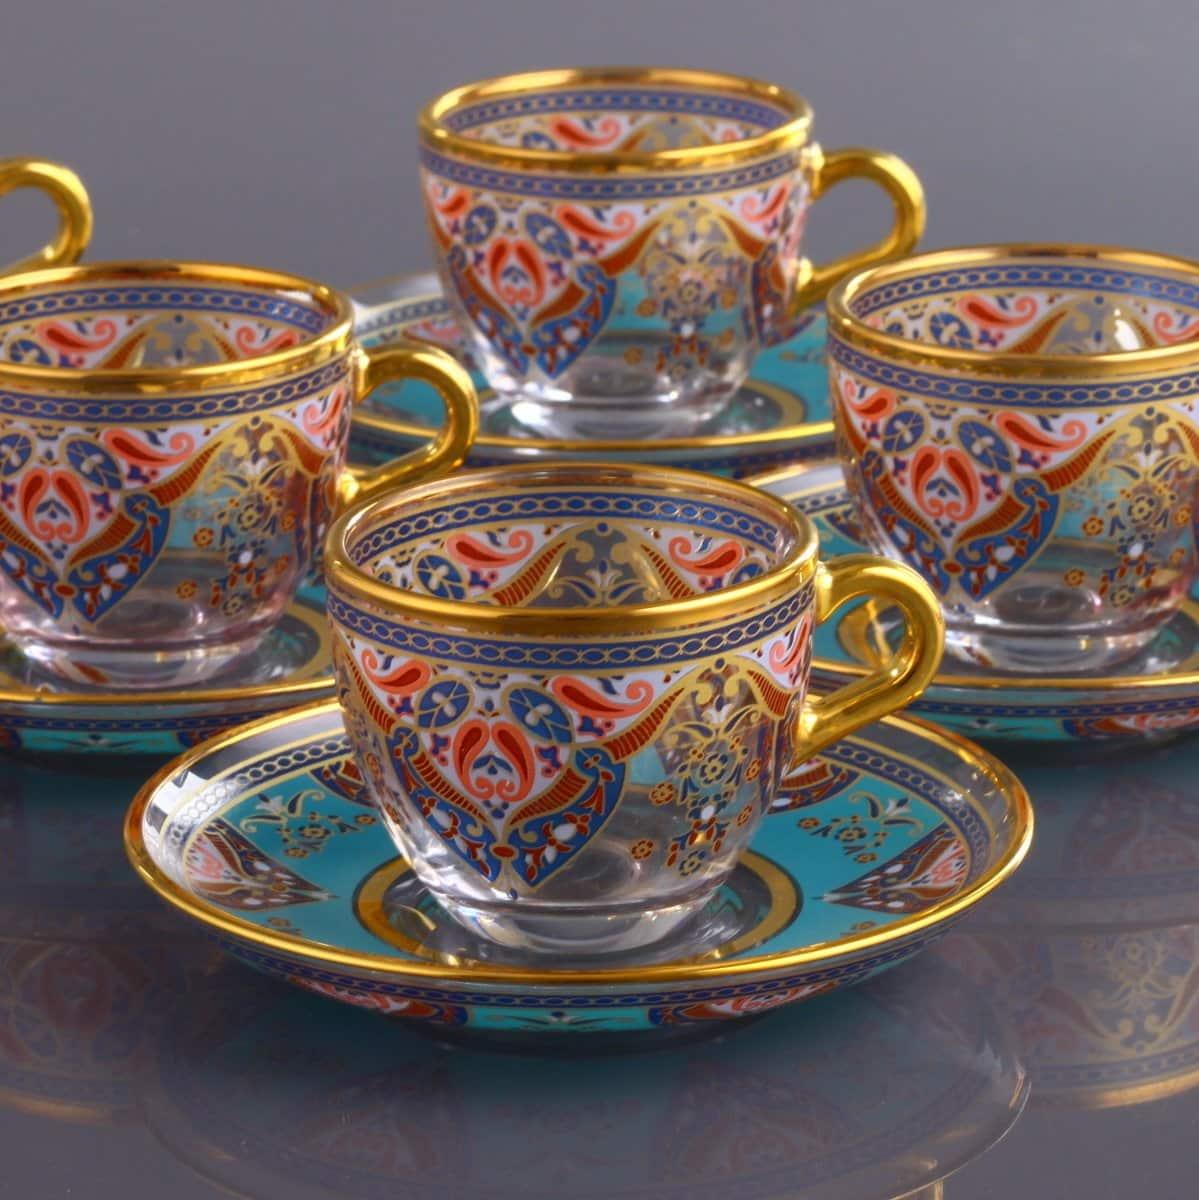 Evla Ethnic Turkish Coffee Cups For Six Person  FairTurkcom